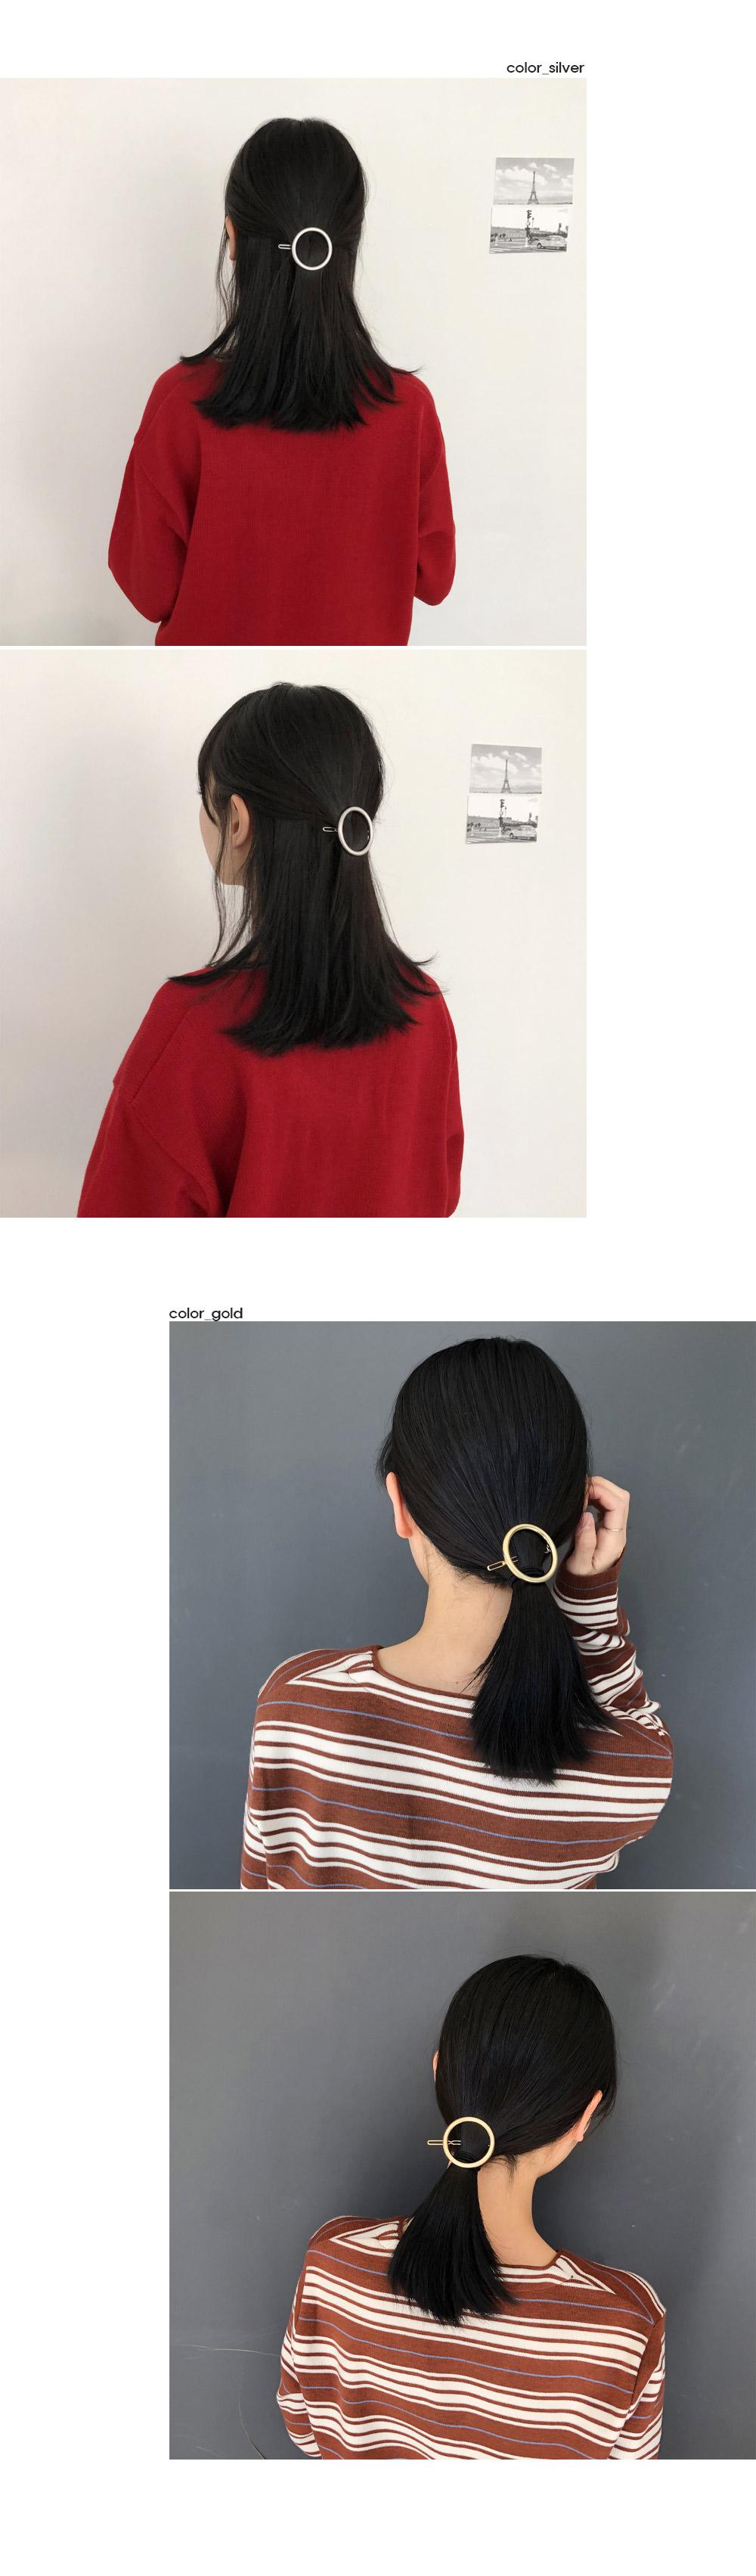 Round hairpin